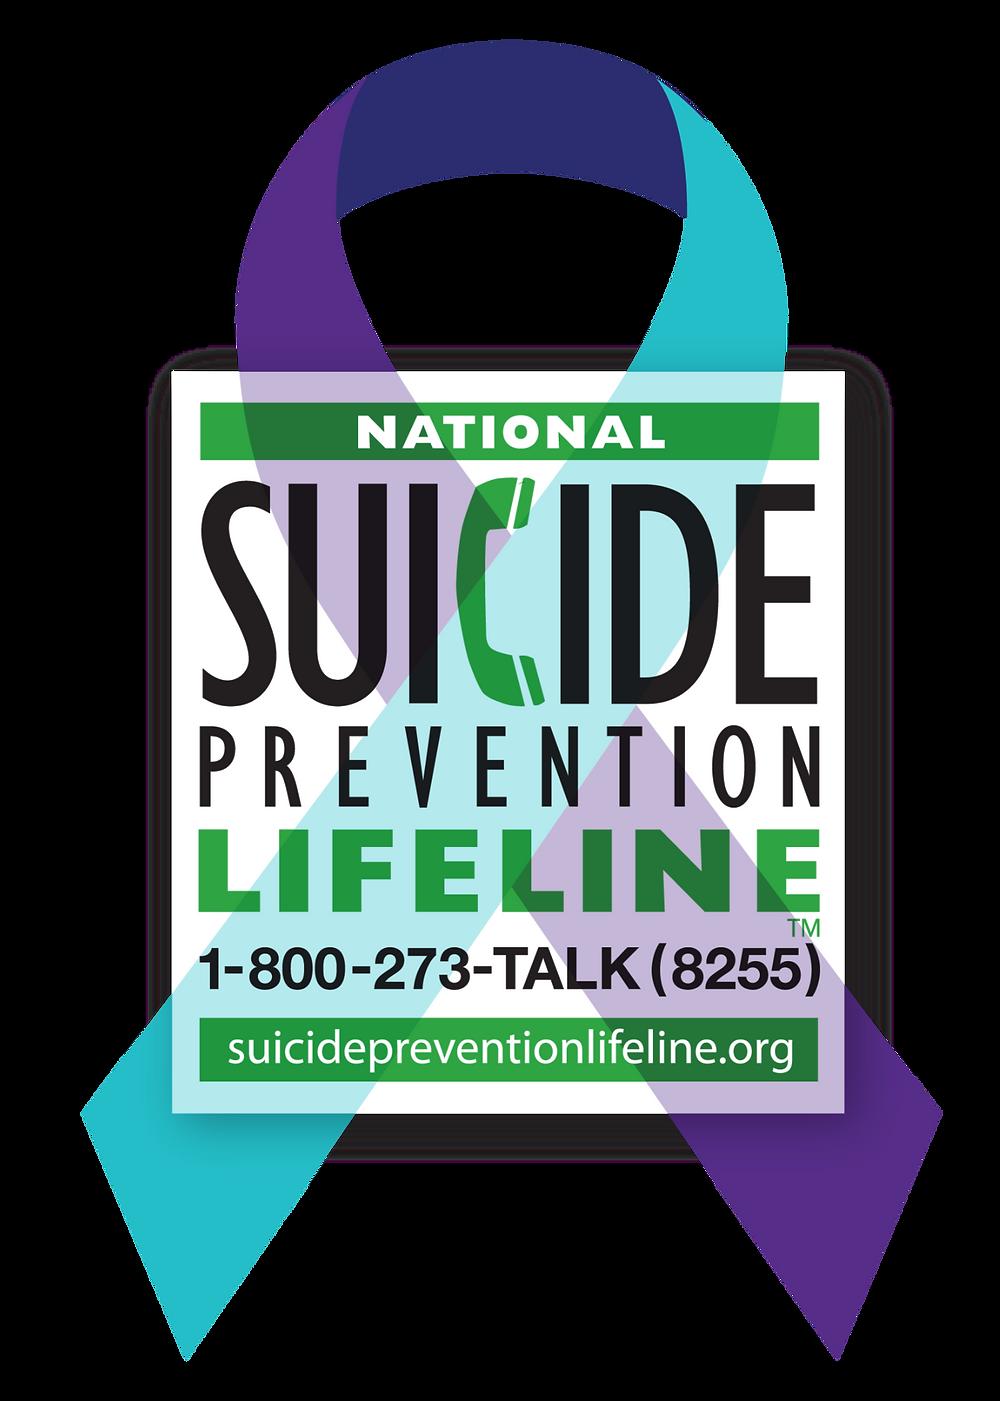 National Suicide Prevention Lifeline information